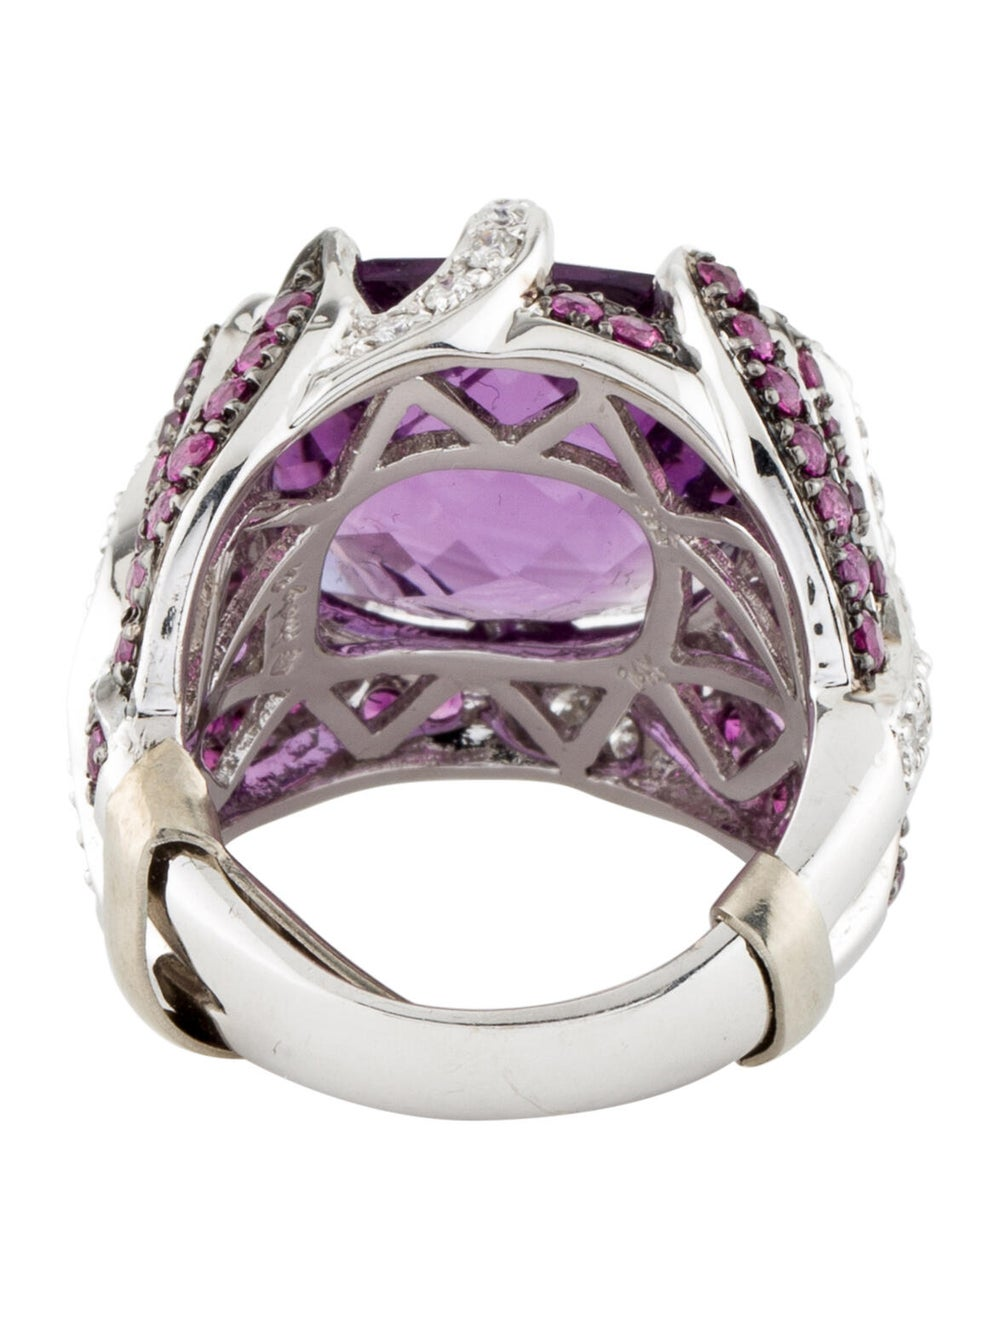 Ring 14K Amethyst, Ruby & Diamond Cocktail Ring S… - image 4